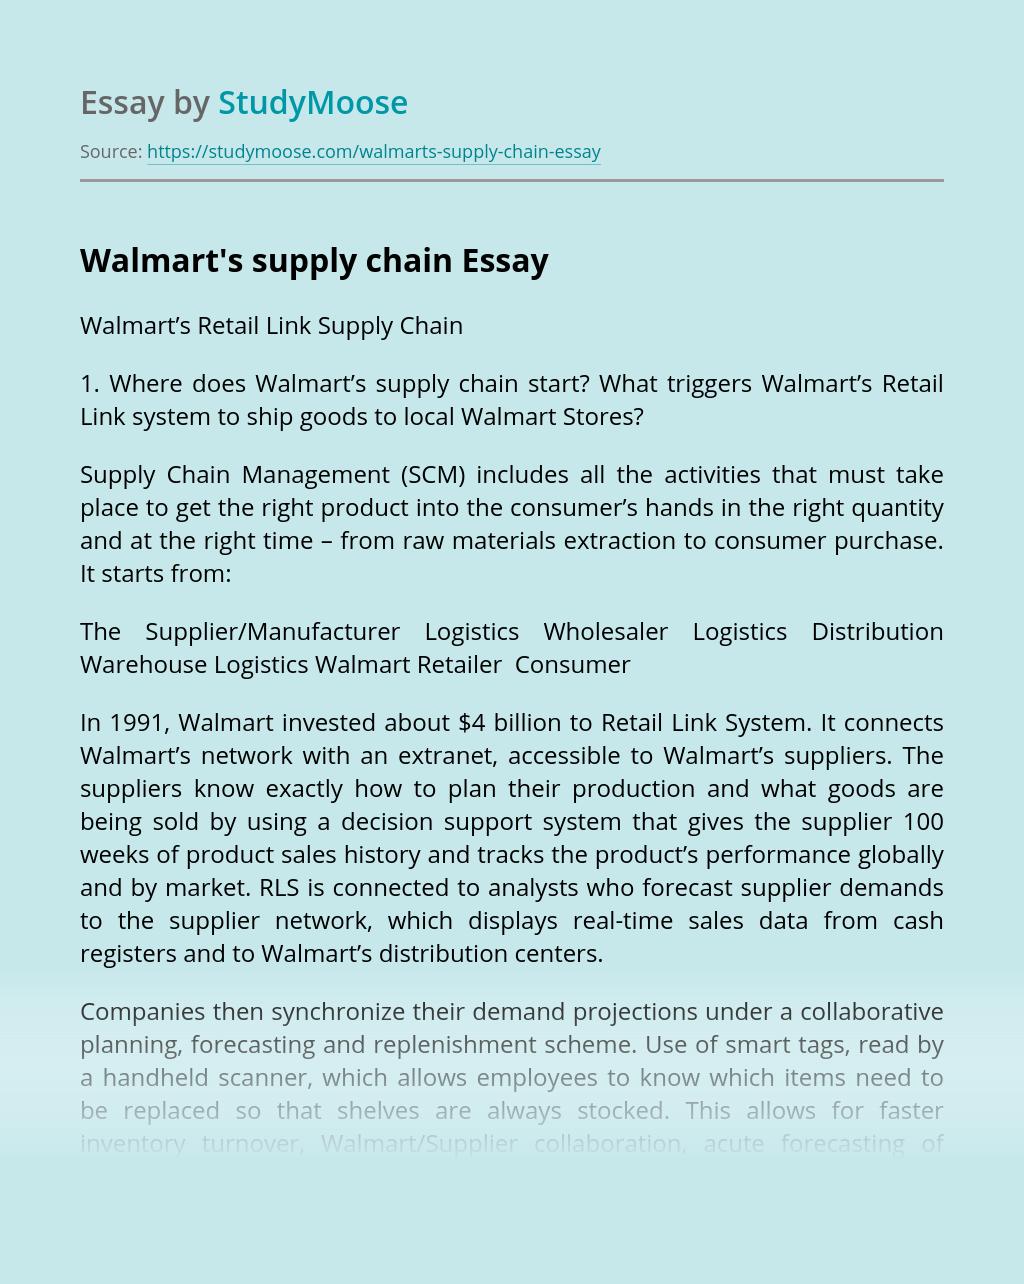 Walmart's supply chain